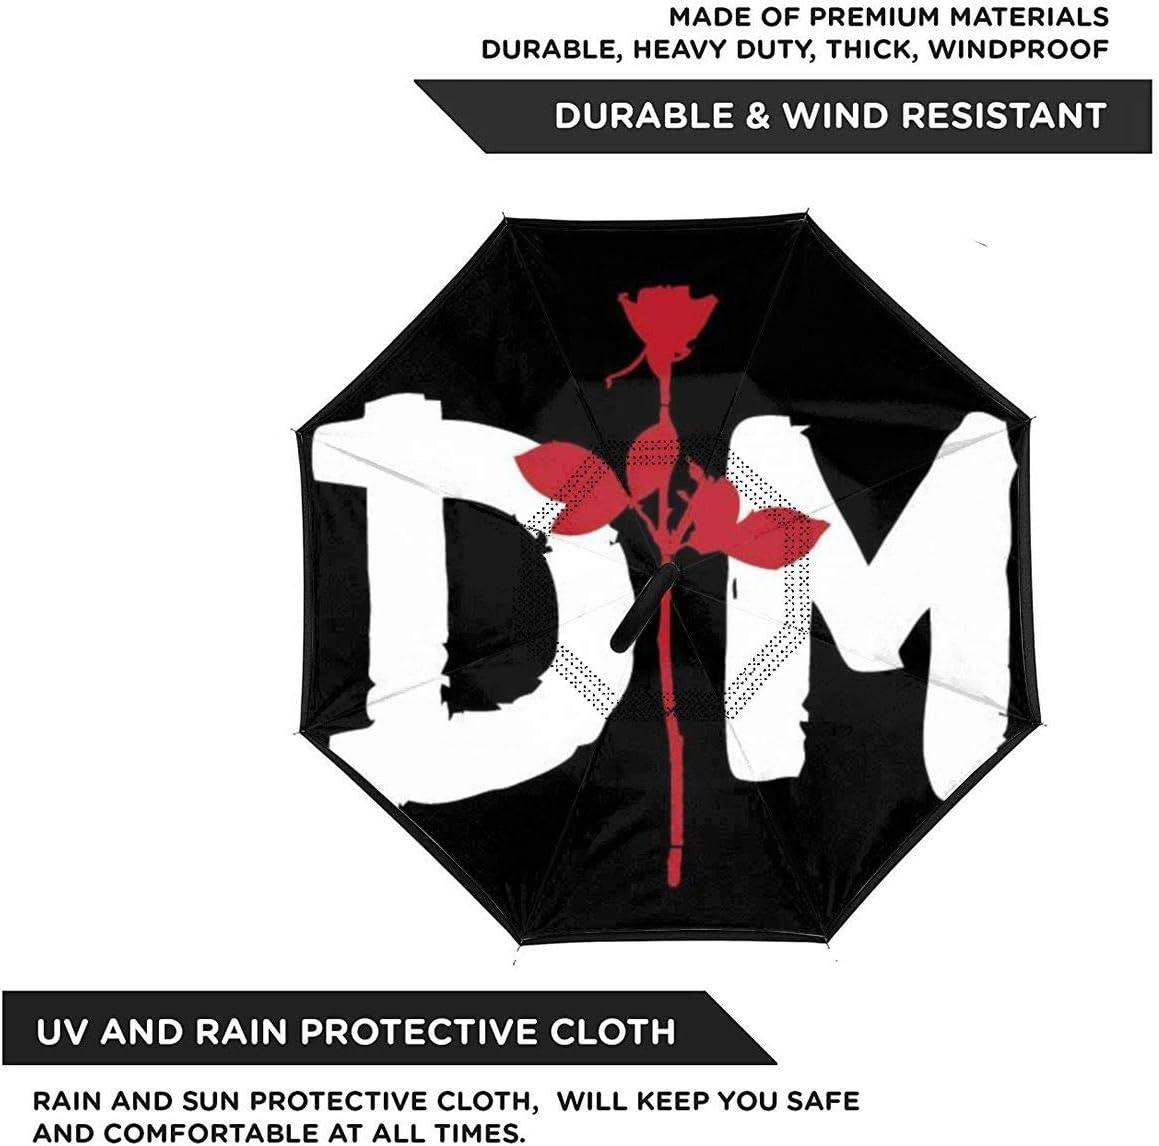 Hgnhgbn Depeche Mode Windproof And UV Resistant Fabric Car Reverse Umbrella